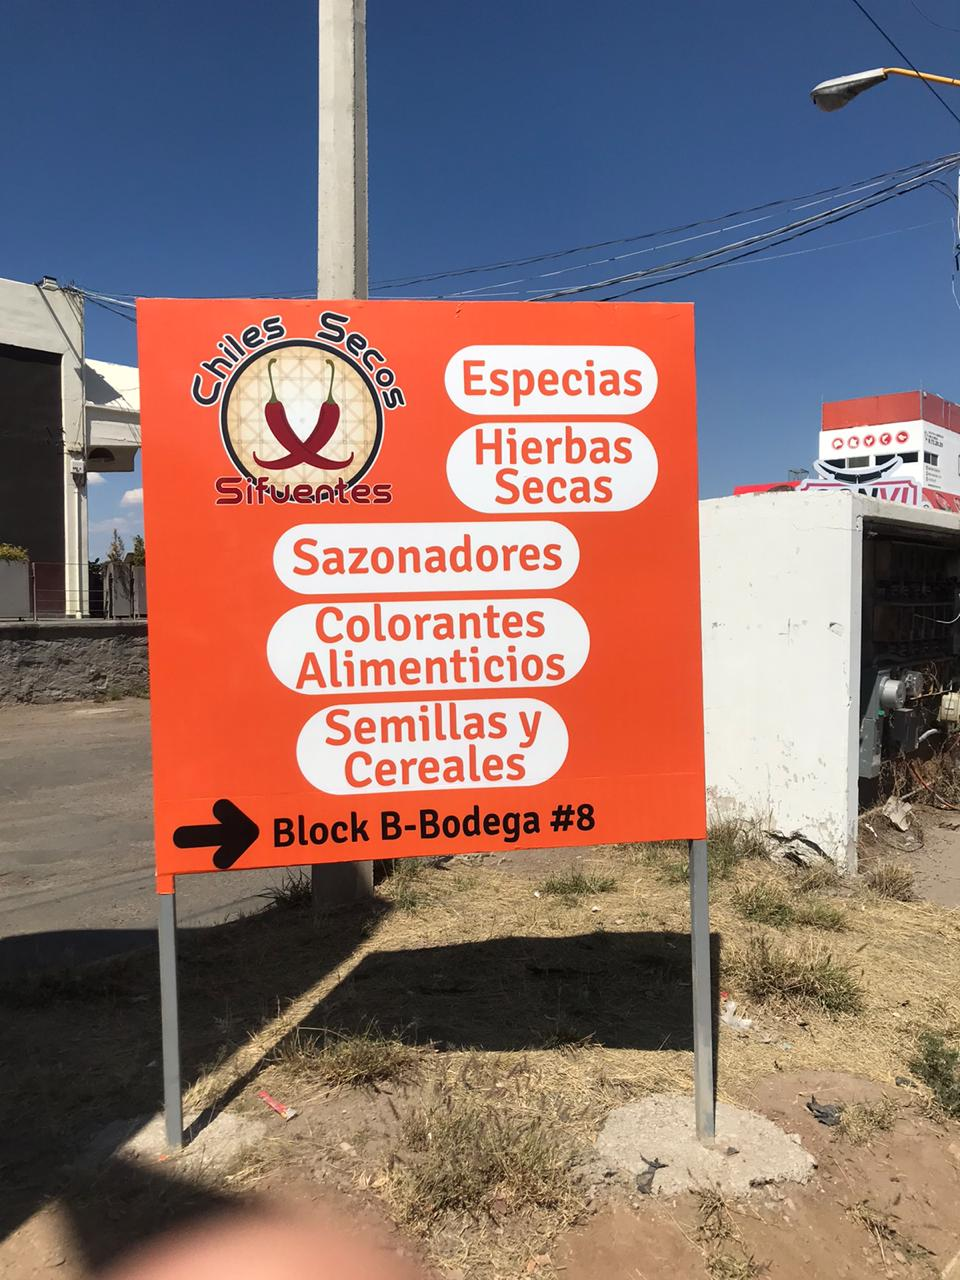 Chiles Secos Sifuentes